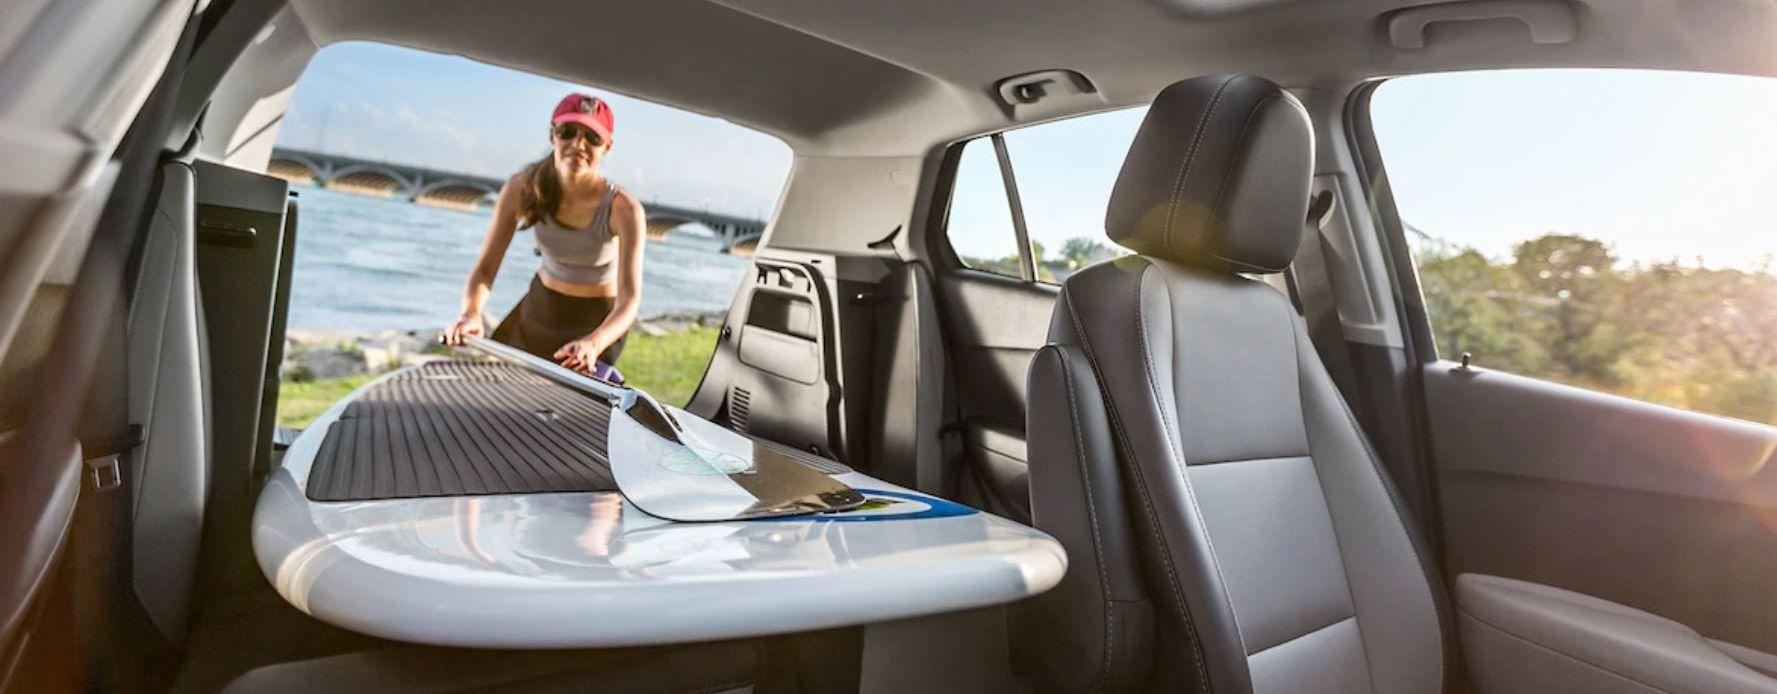 2019 Chevrolet Trax's Spacious Interior